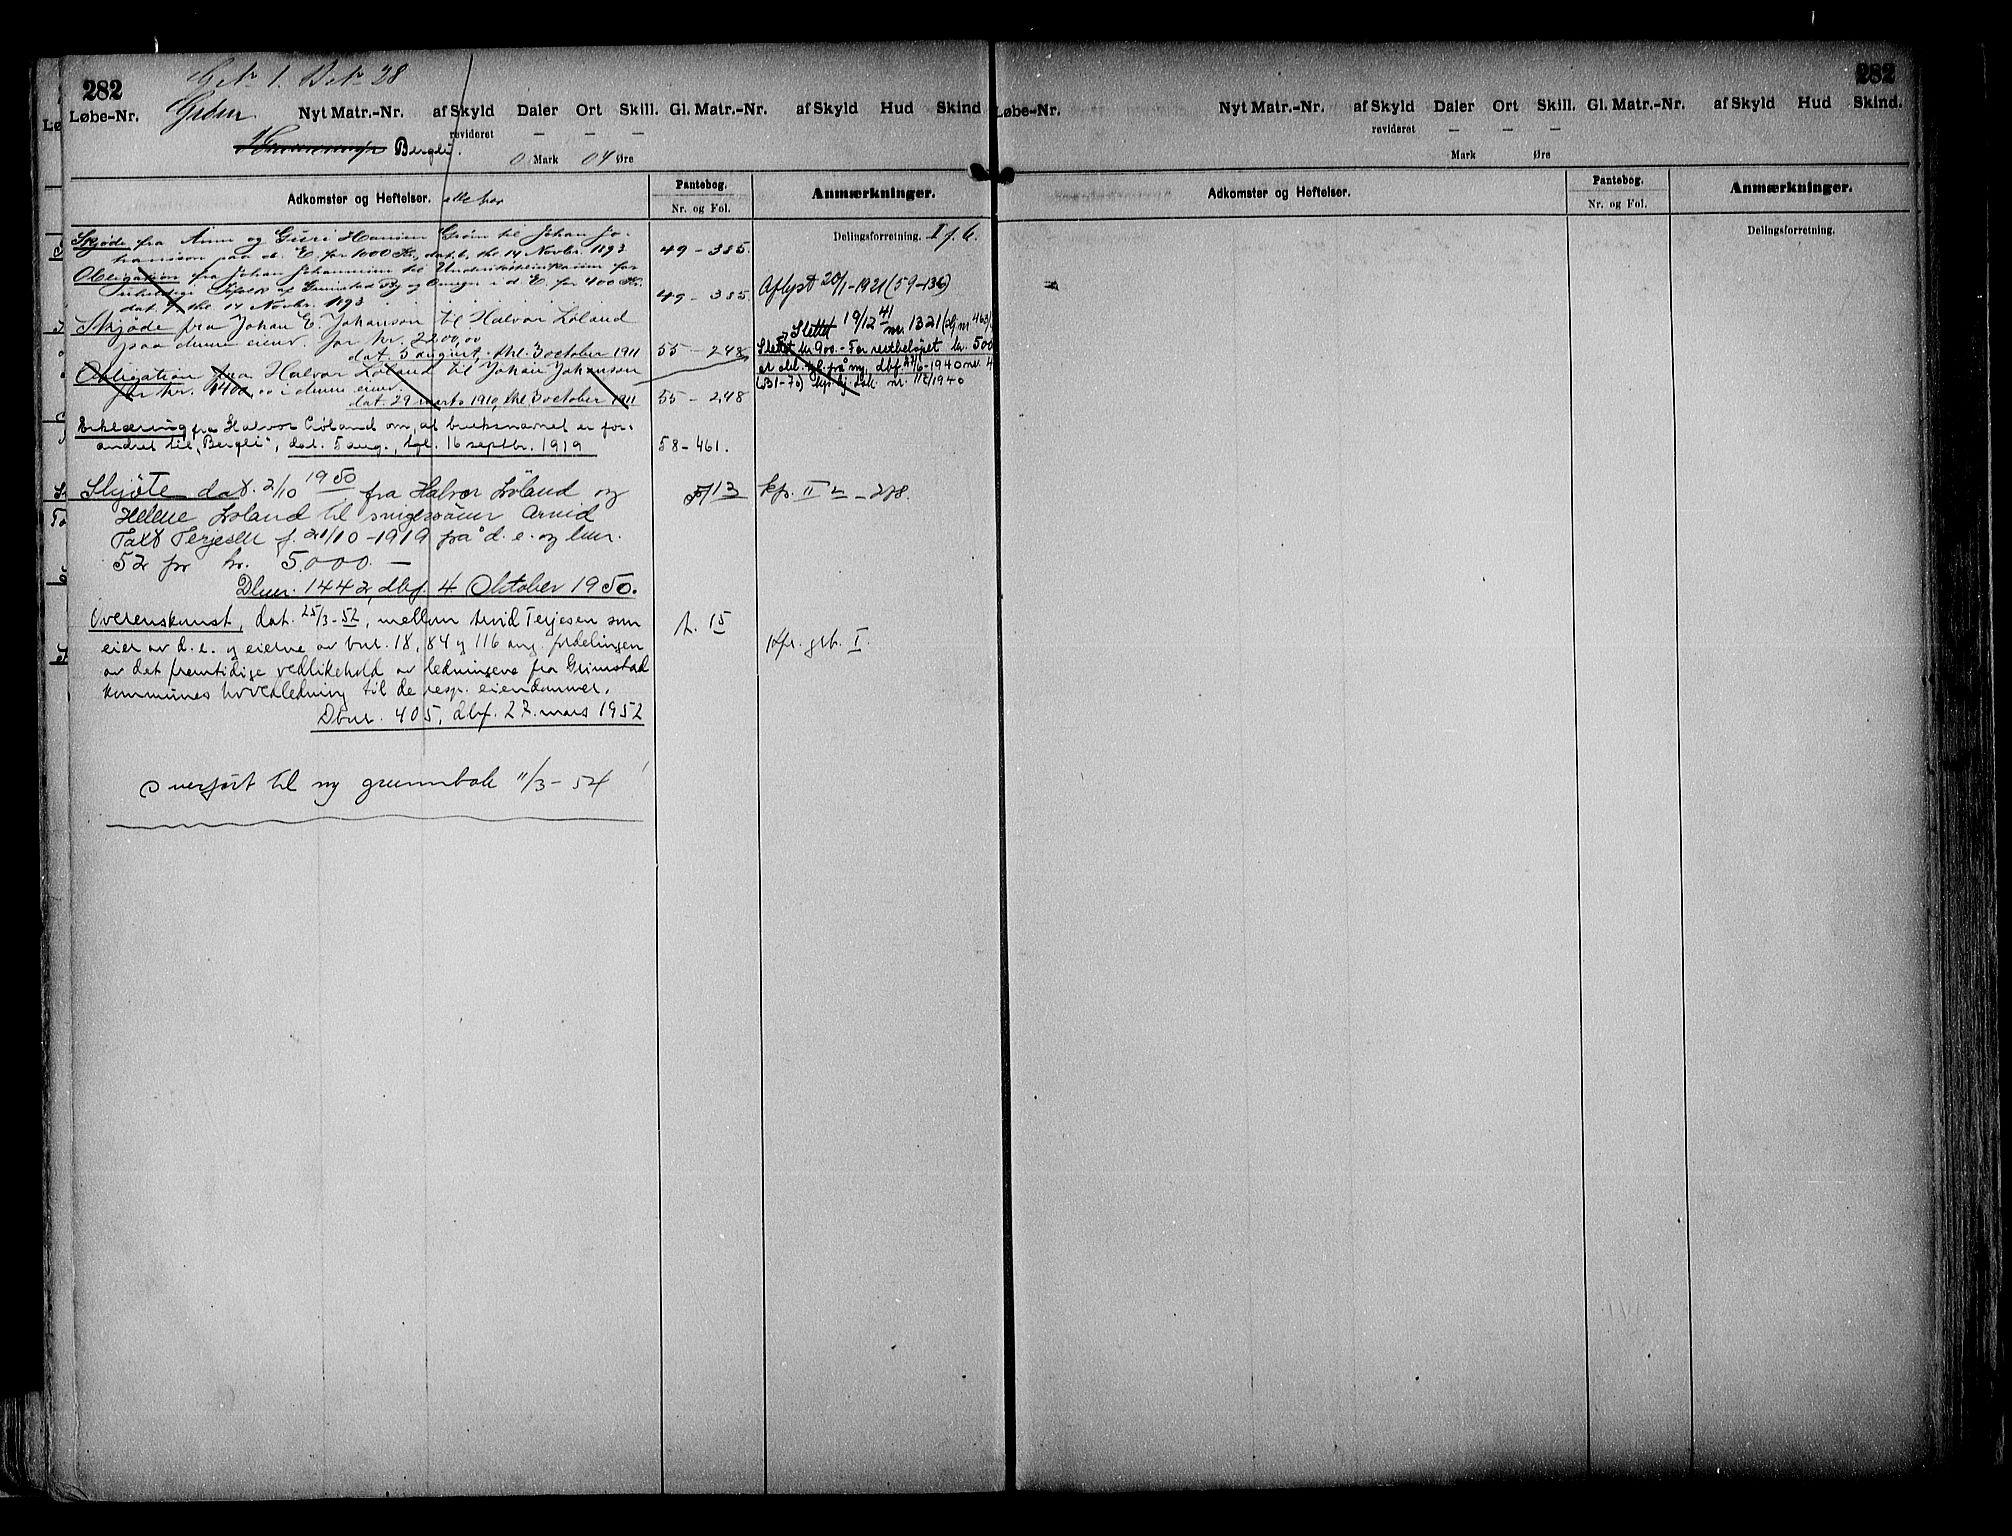 SAK, Vestre Nedenes/Sand sorenskriveri, G/Ga/L0018: Panteregister nr. 13b, 1872-1956, s. 282